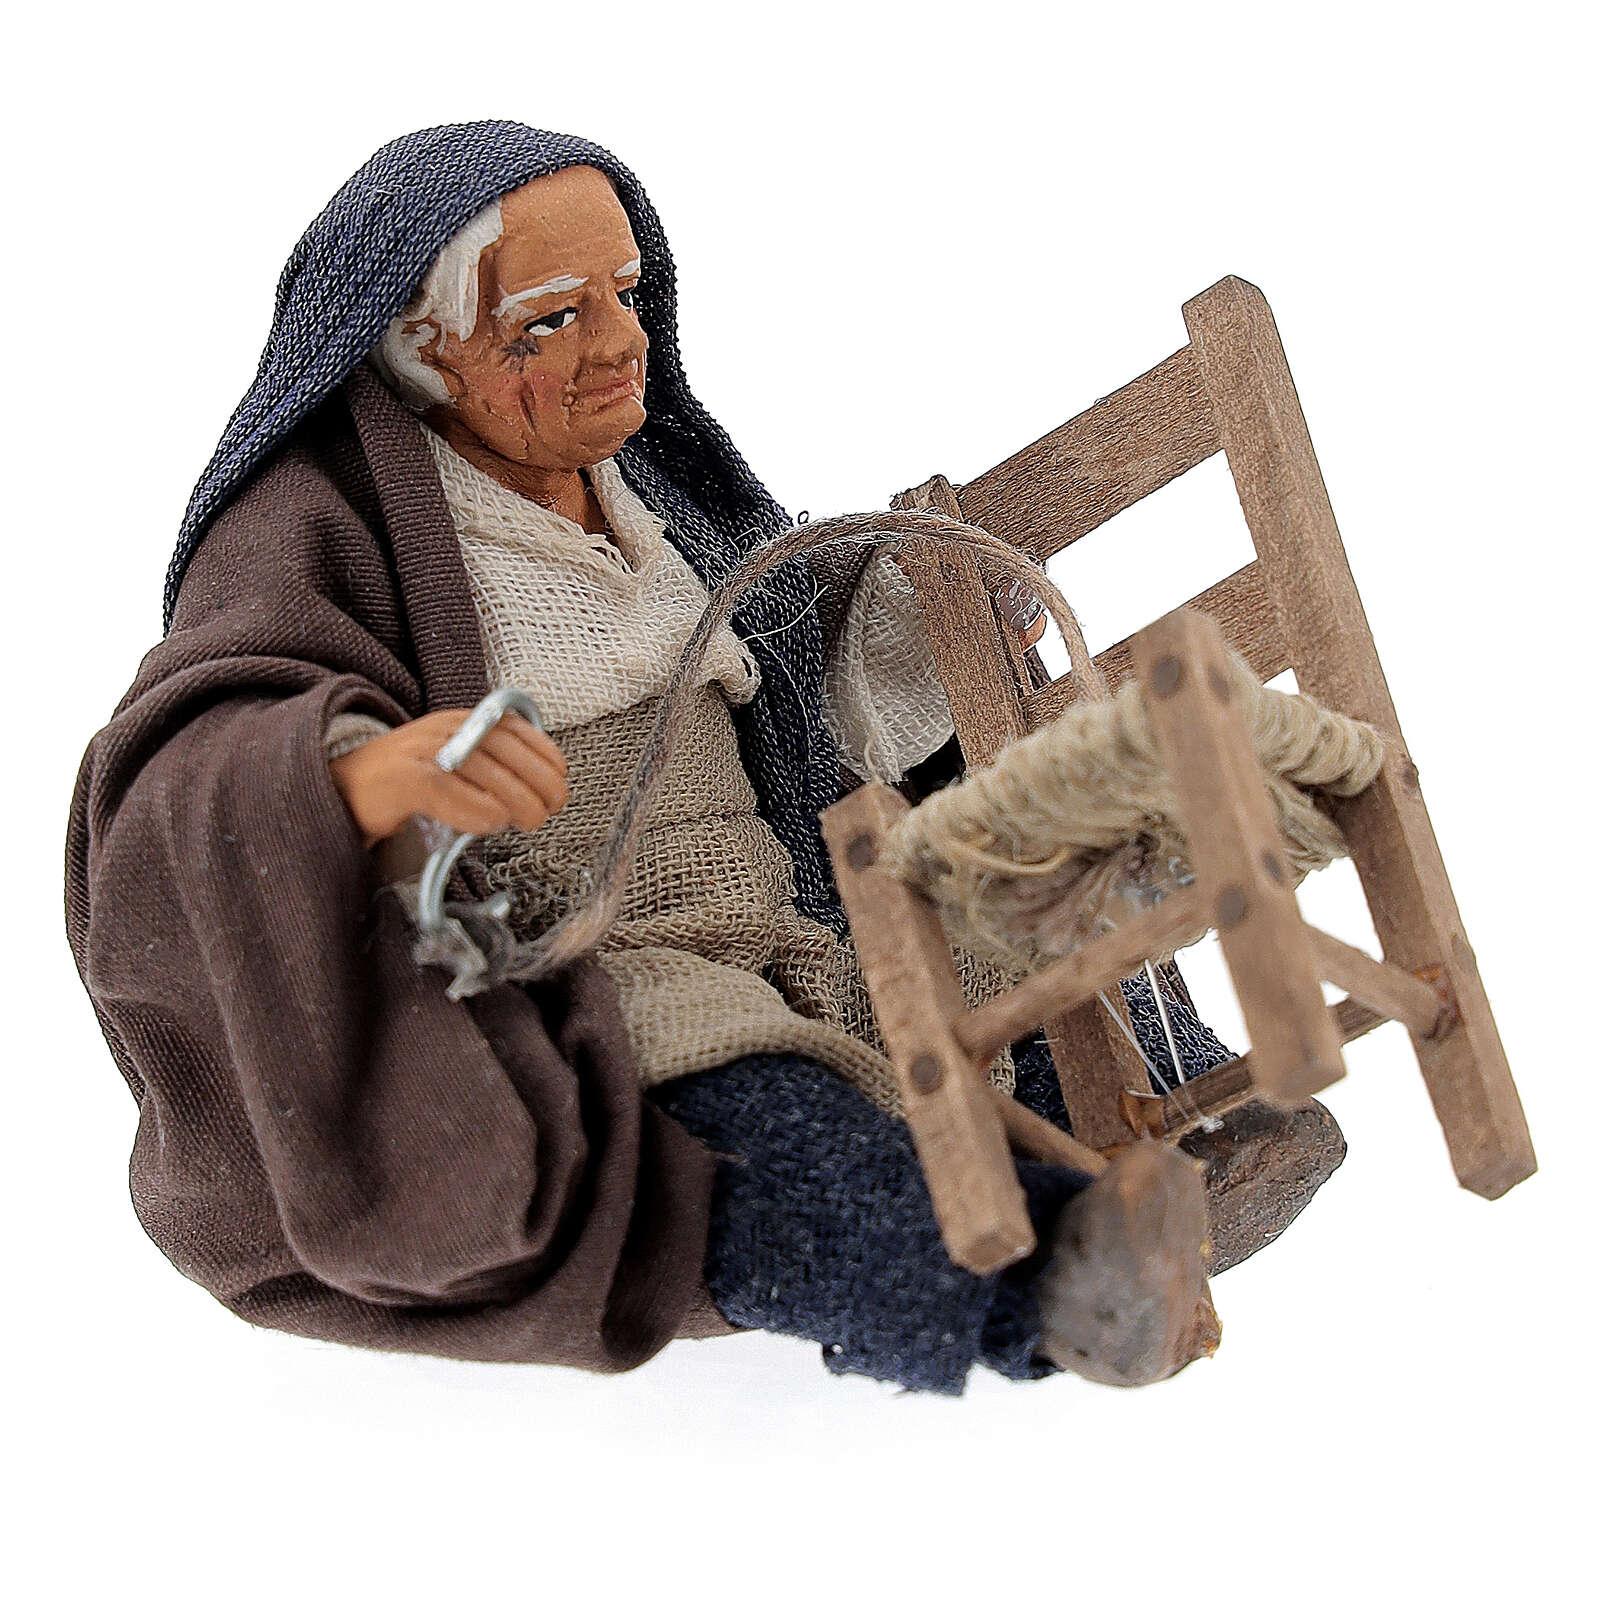 Chair fixer sitting, Neapolitan Nativity 10cm 4